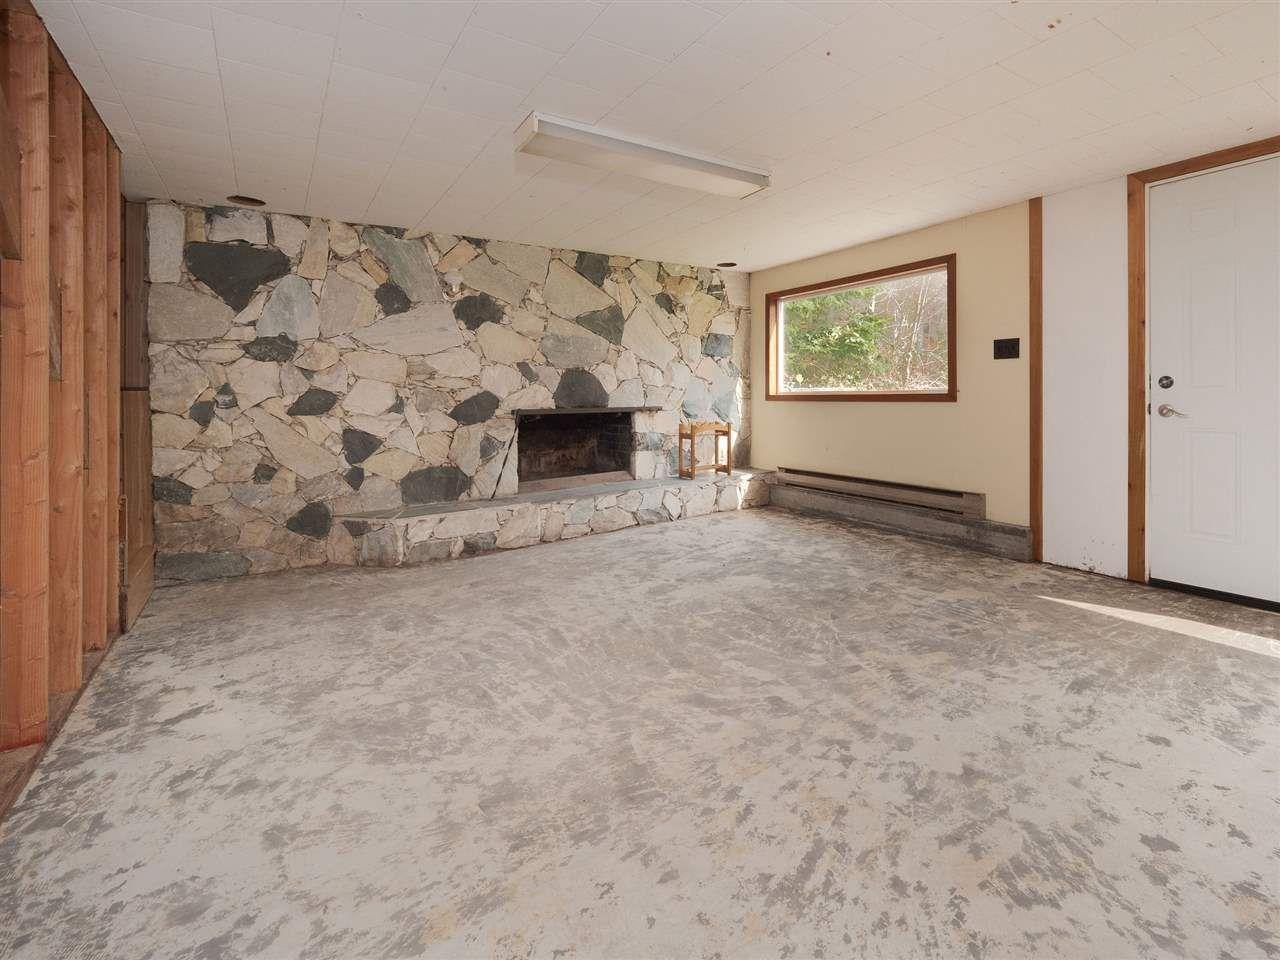 Photo 17: Photos: 6820 NORWEST BAY Road in Sechelt: Sechelt District House for sale (Sunshine Coast)  : MLS®# R2553107